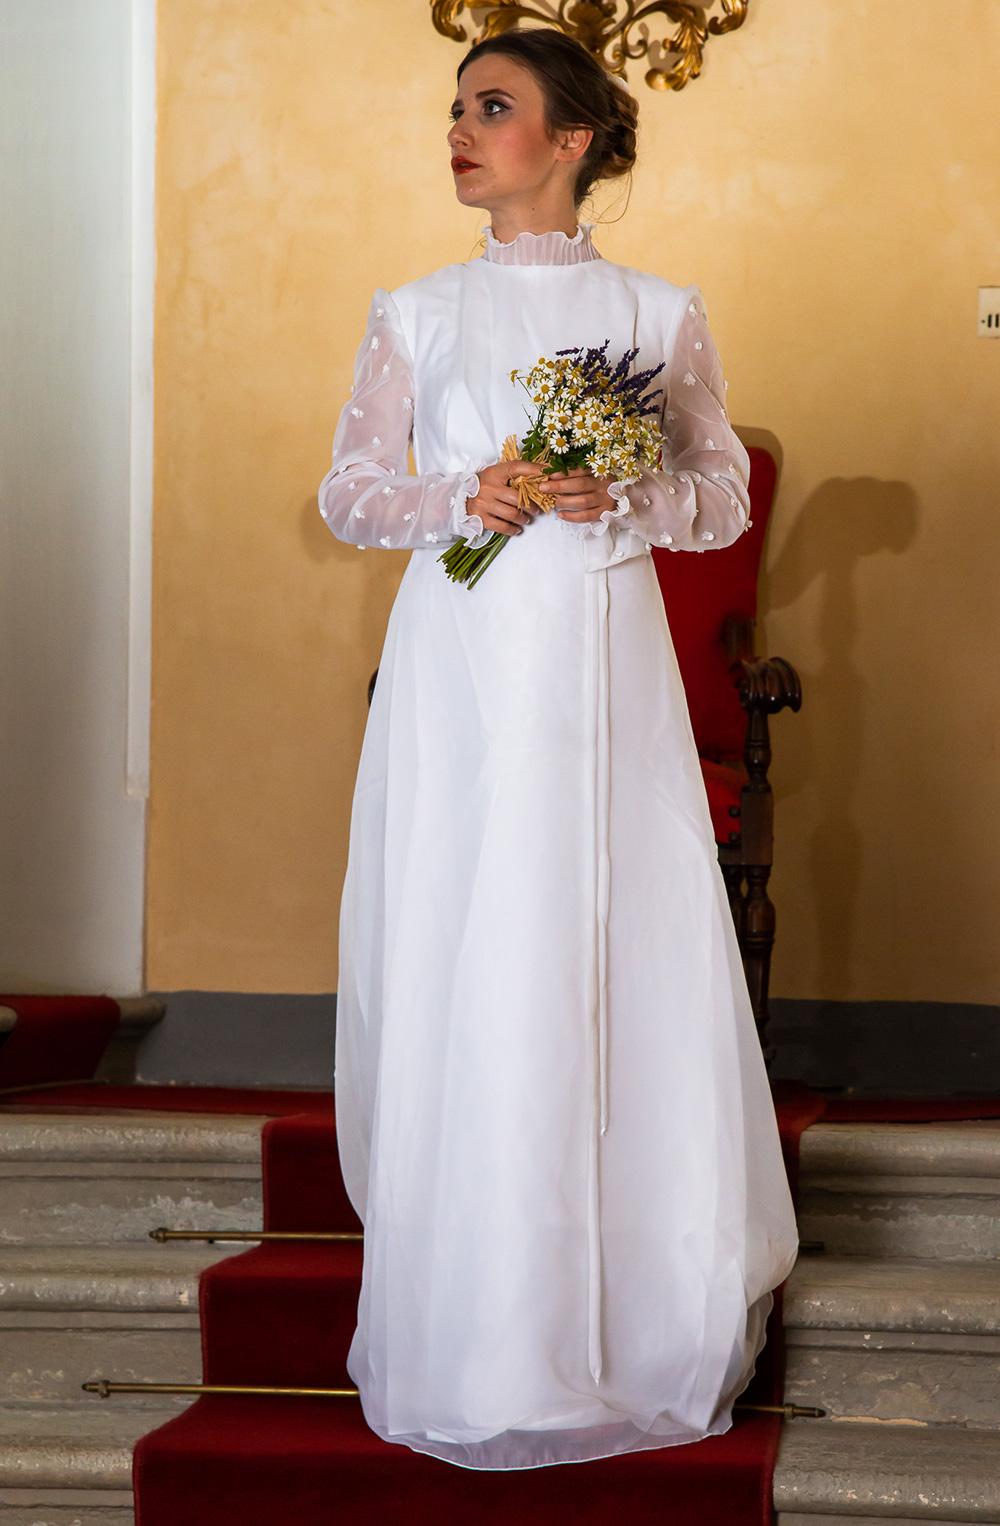 Vestiti Da Sposa Anni 80.Abito Da Sposa Vintage Anni 70 Ricottine Vintage Shop